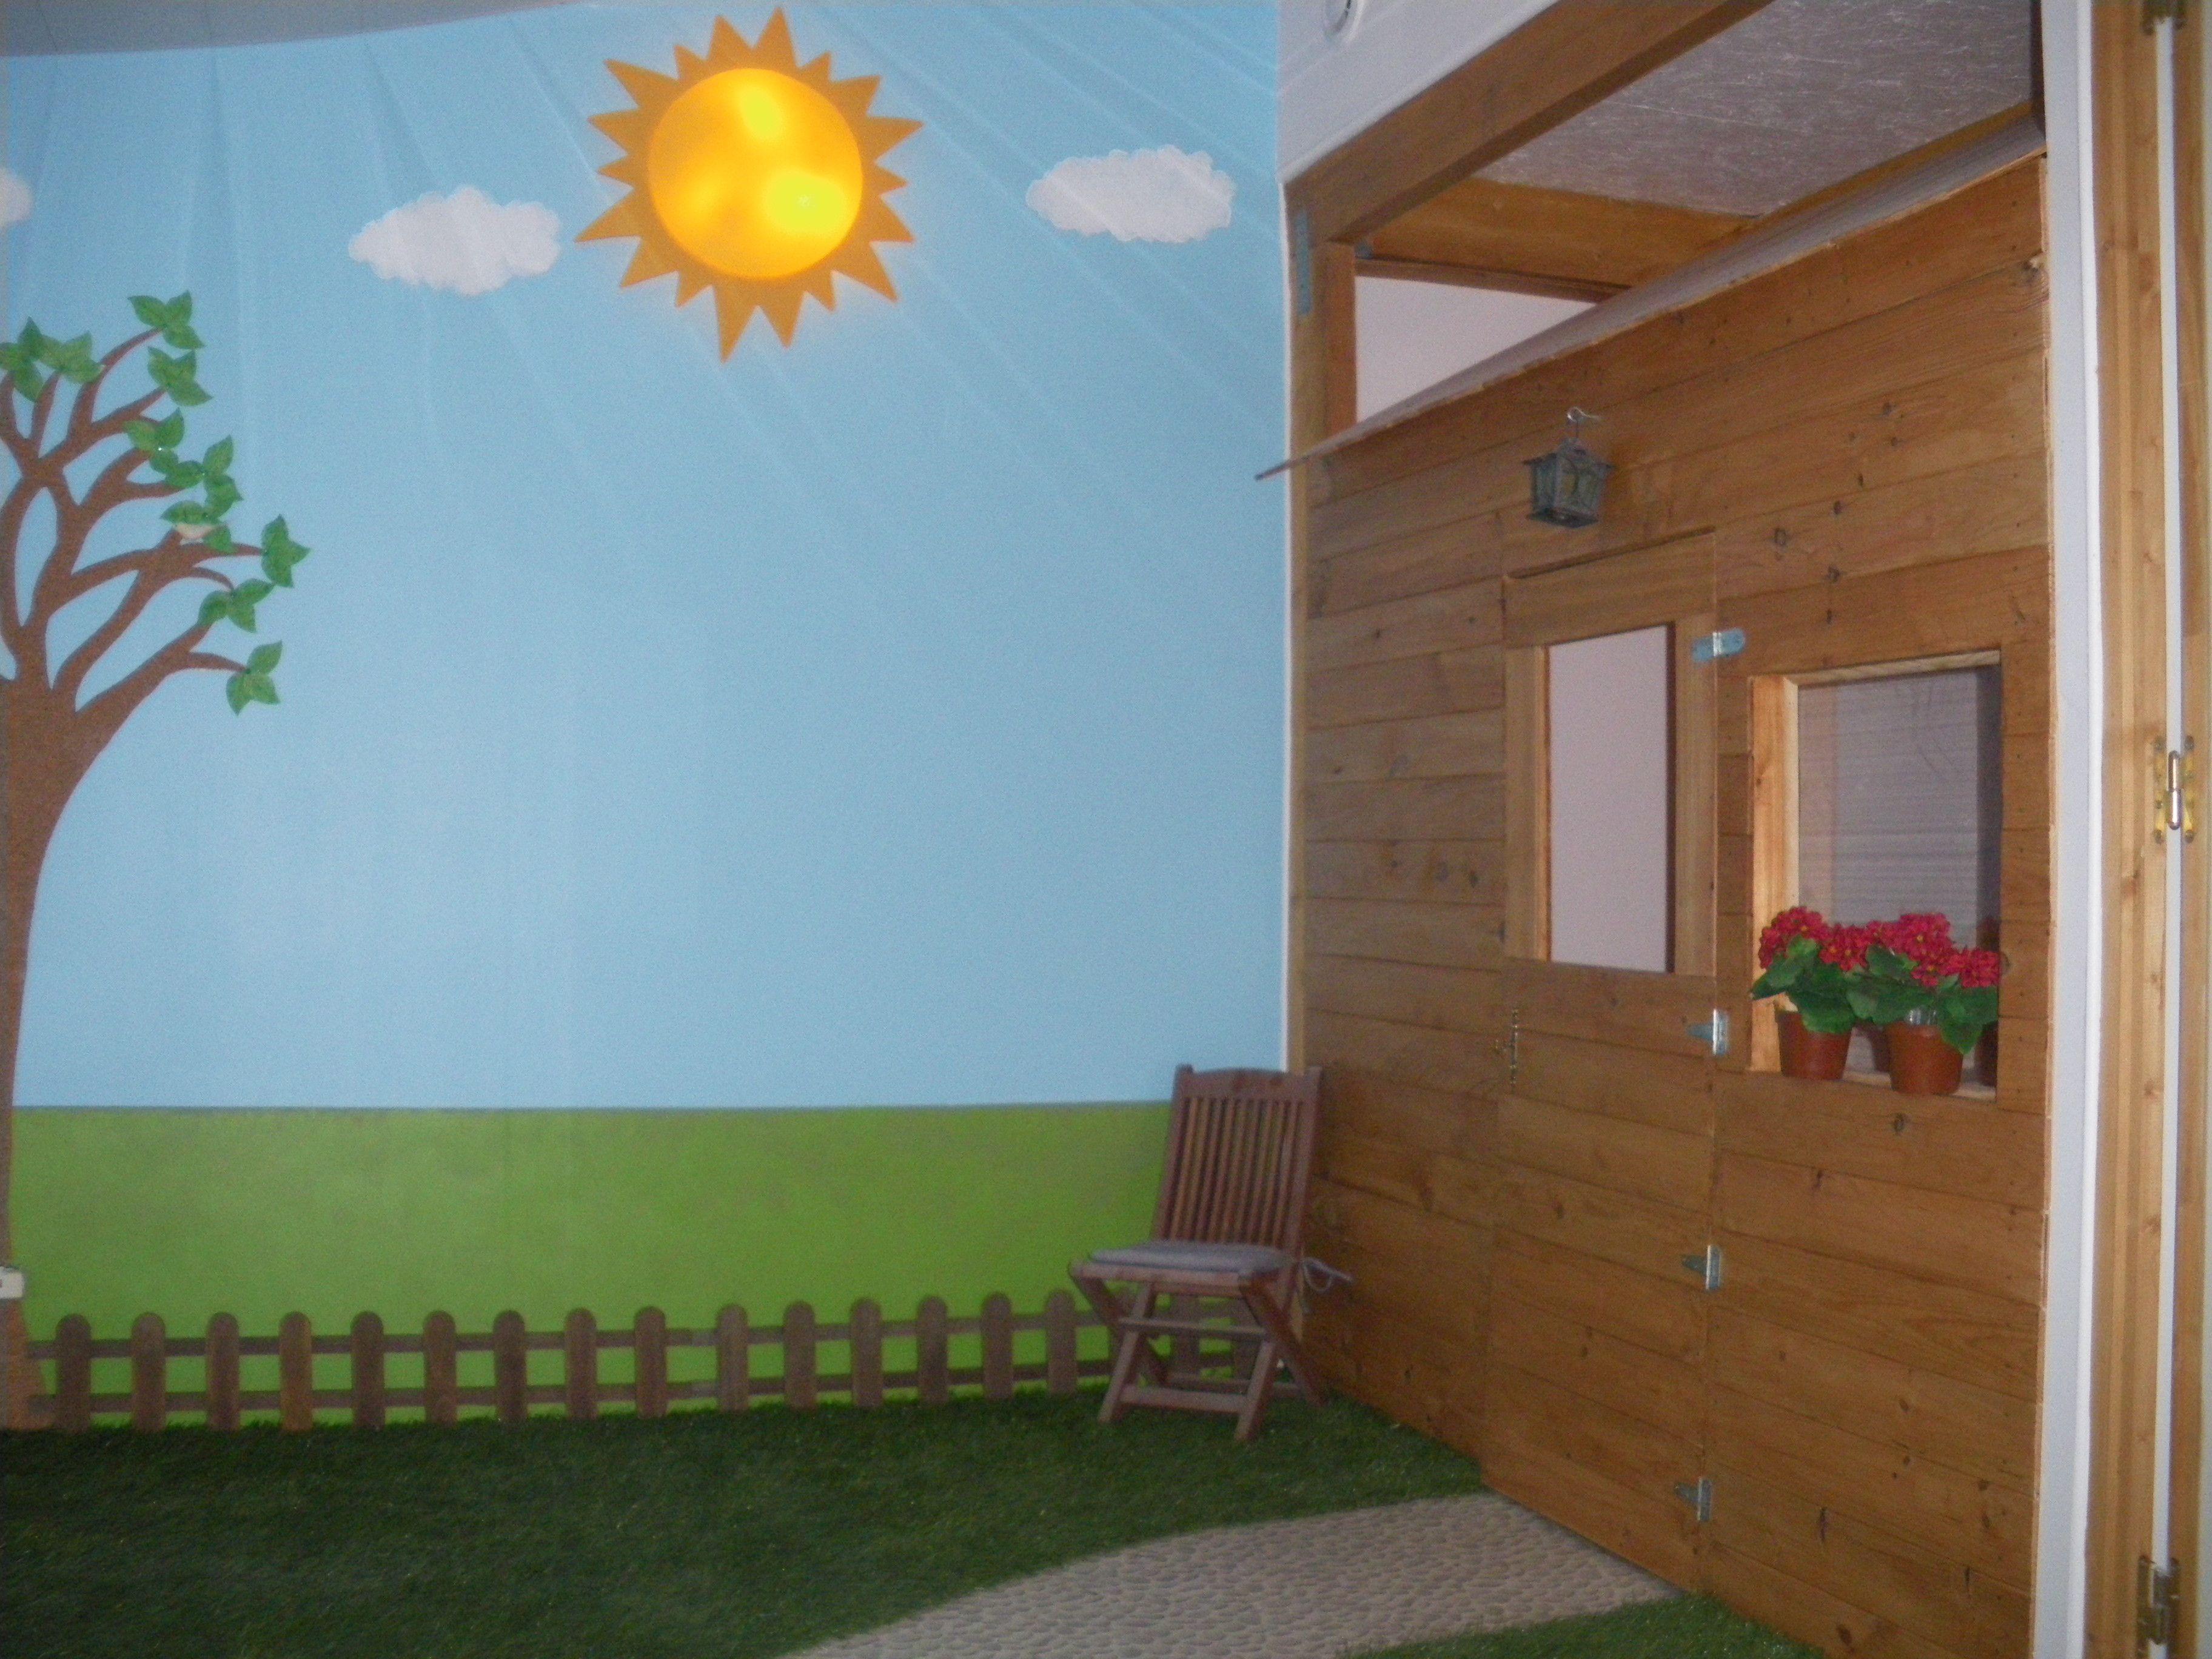 salle de jeu jardin id es creations pour enfants pinterest. Black Bedroom Furniture Sets. Home Design Ideas